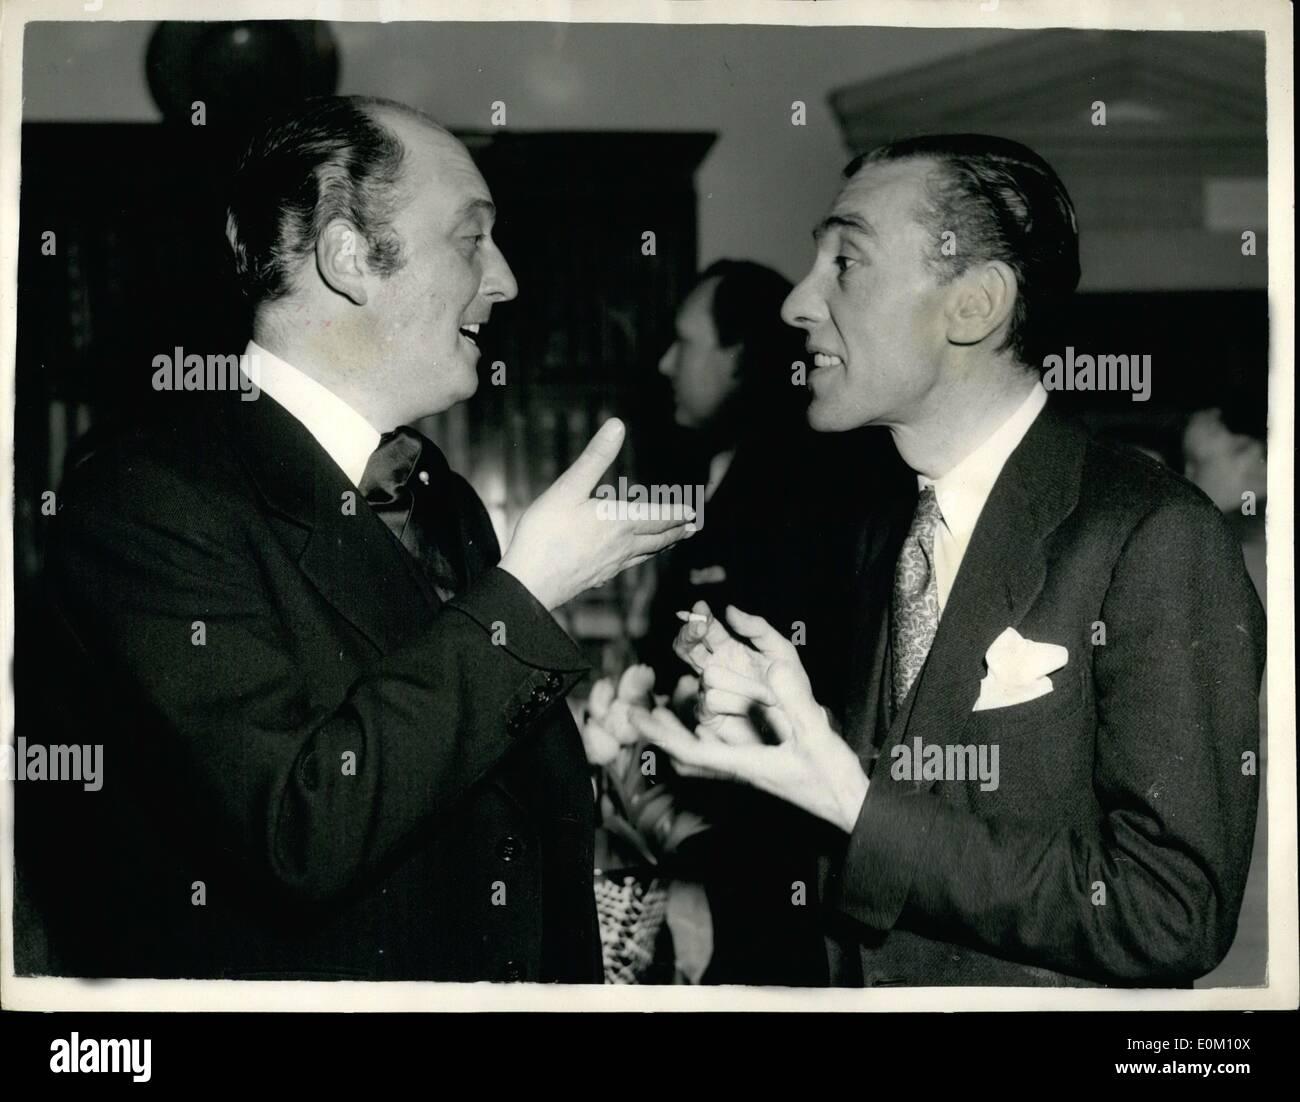 Jan 01 1953 Fashion Soiree To Designers Lady Kenneth Clark Stock Photo Alamy